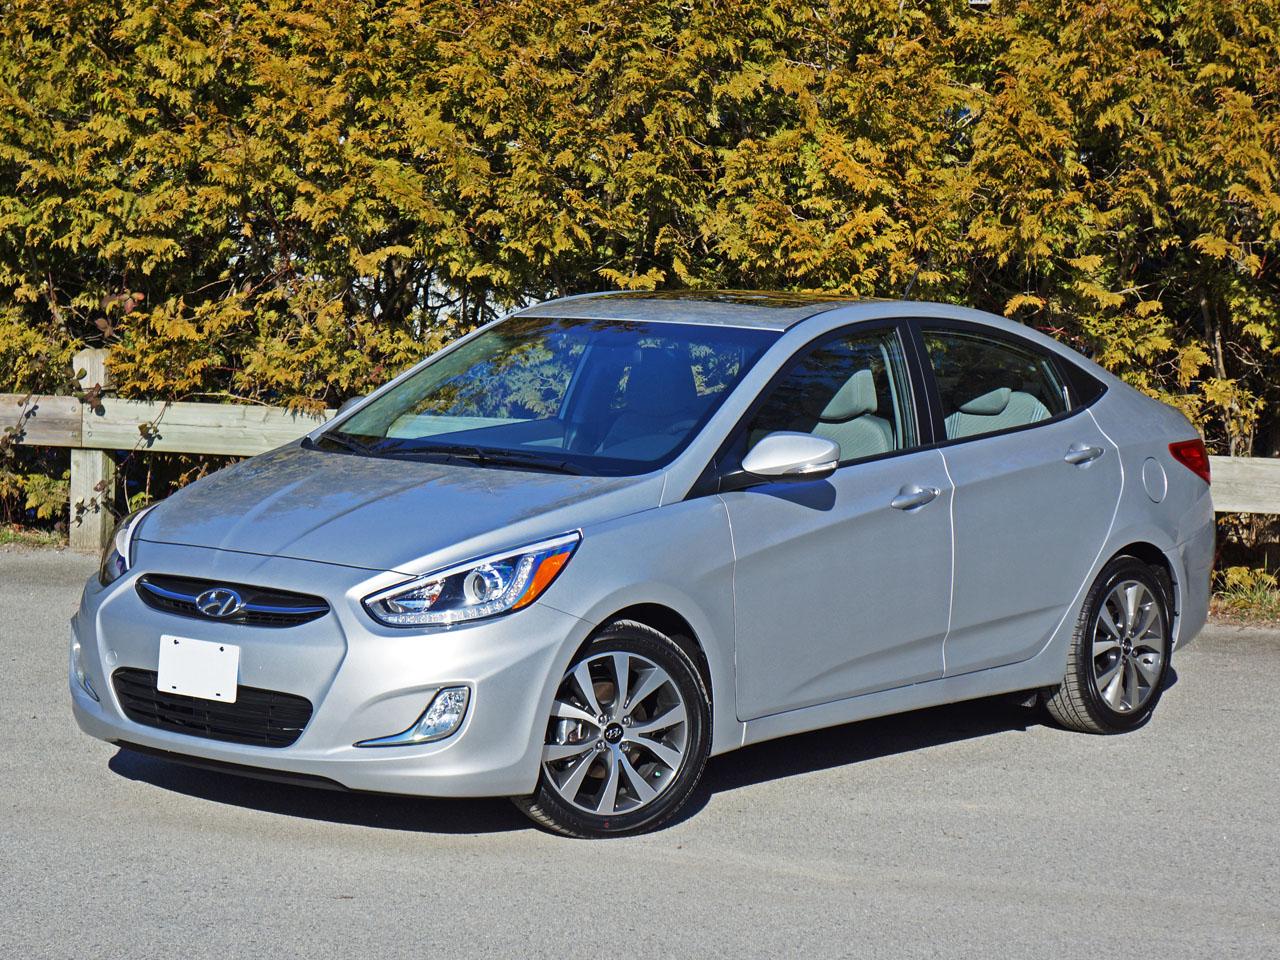 Hyundai Accent Reviews >> 2015 Hyundai Accent Sedan Gls Road Test Review Carcostcanada